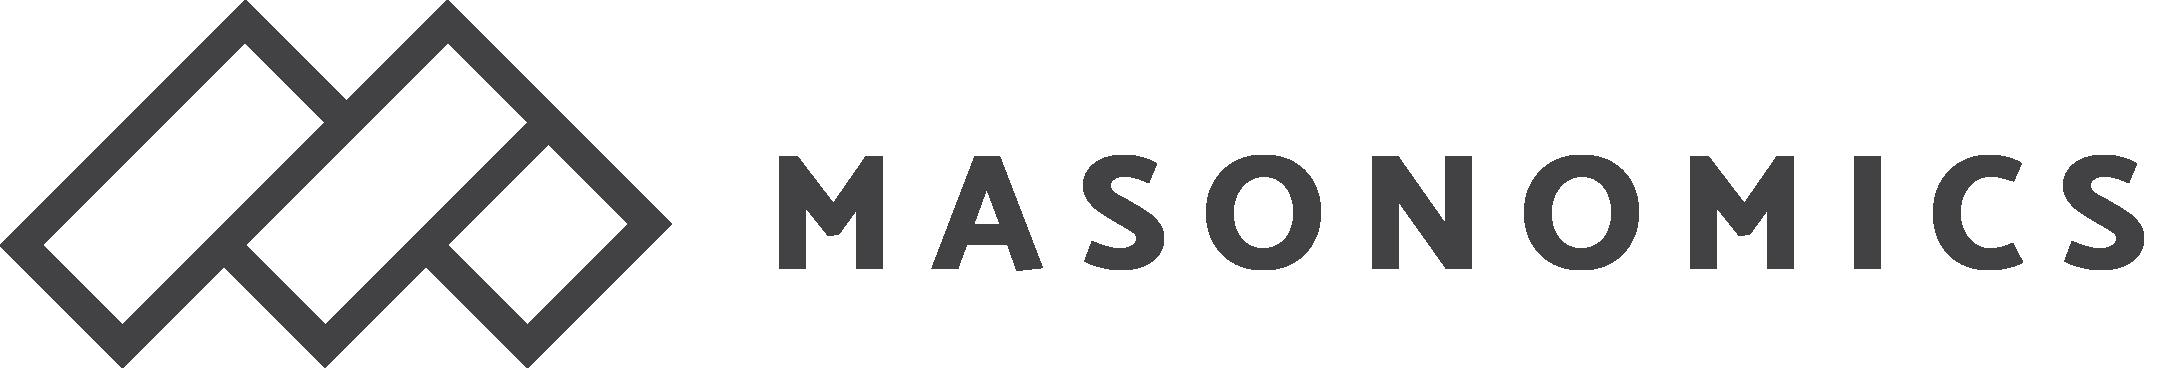 Masonomics